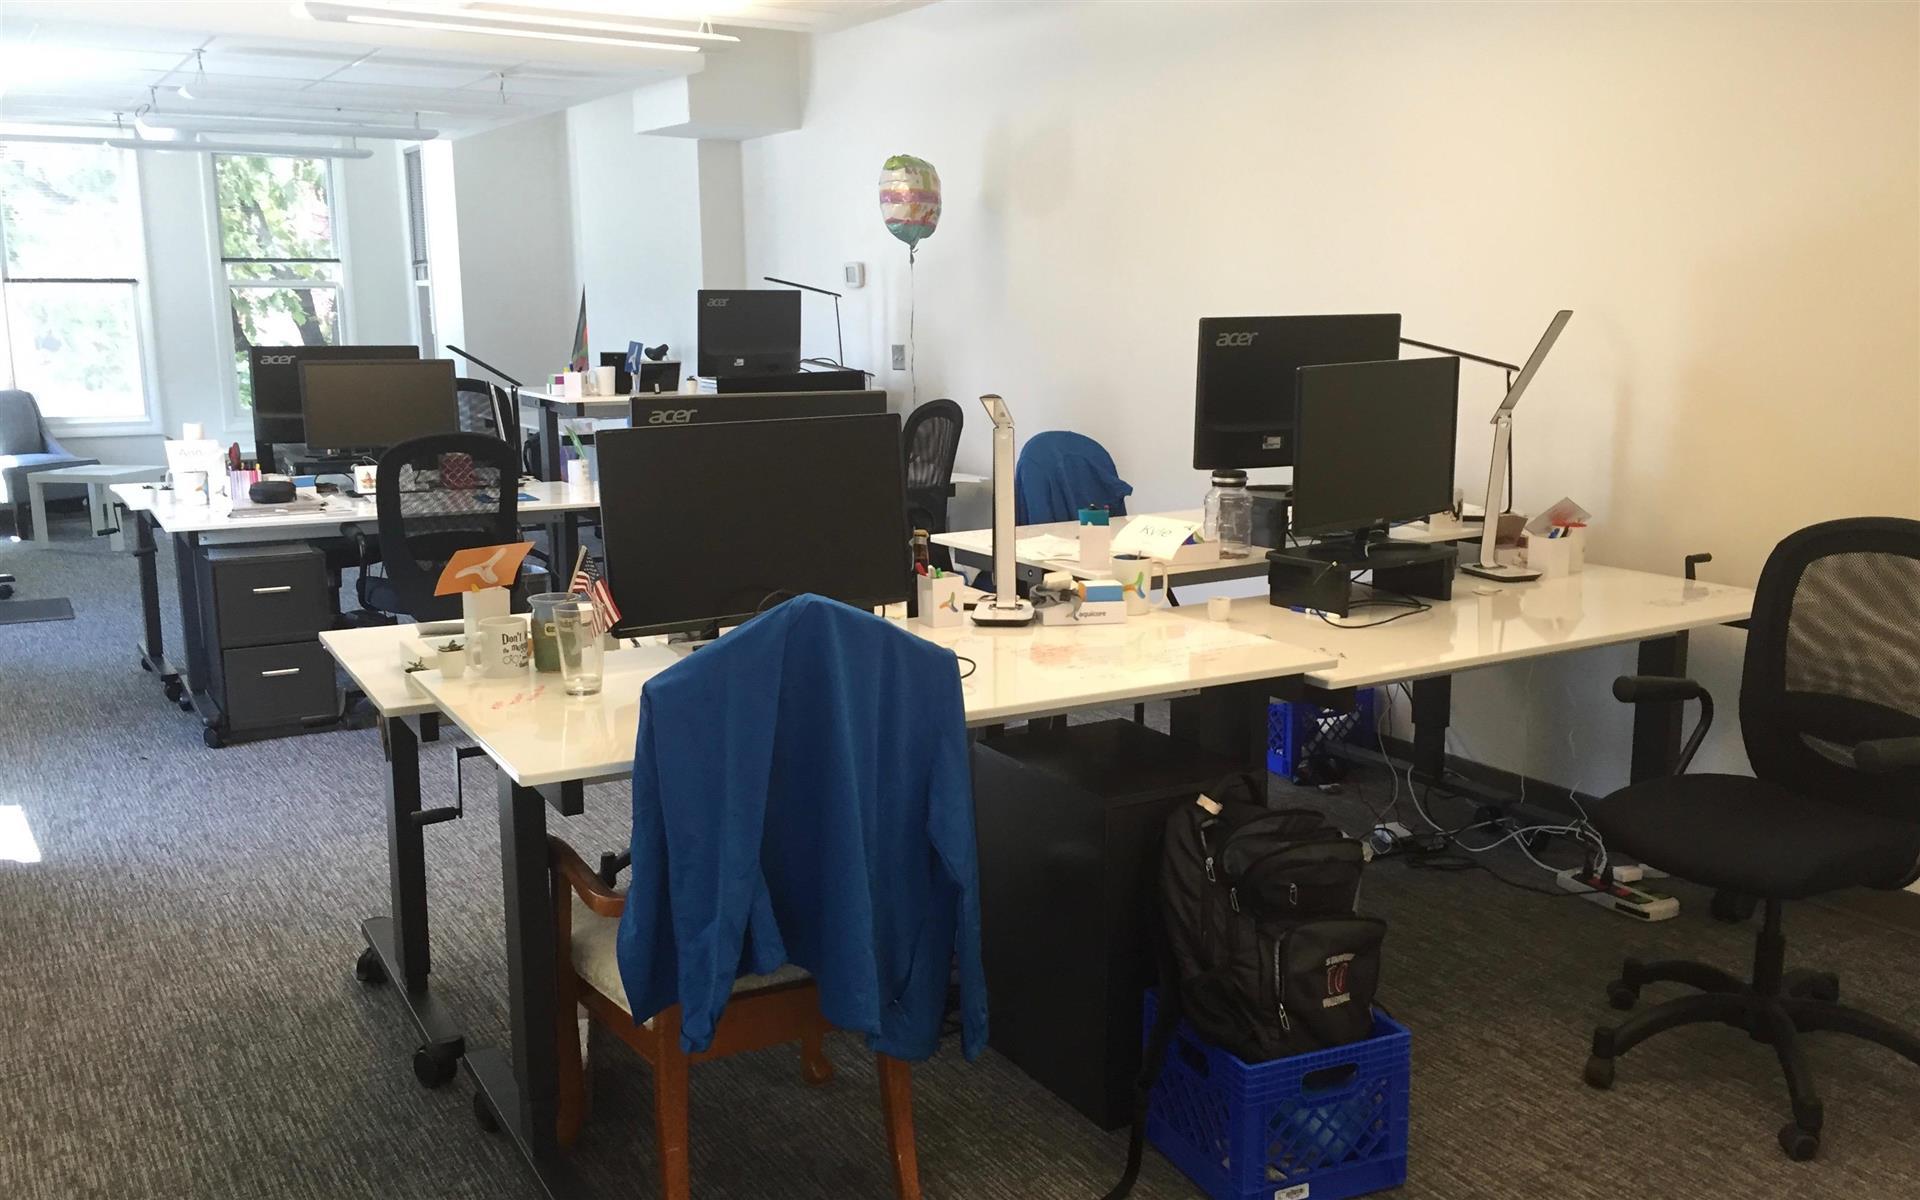 Aquicore - Vibrant and Spacious Team Office